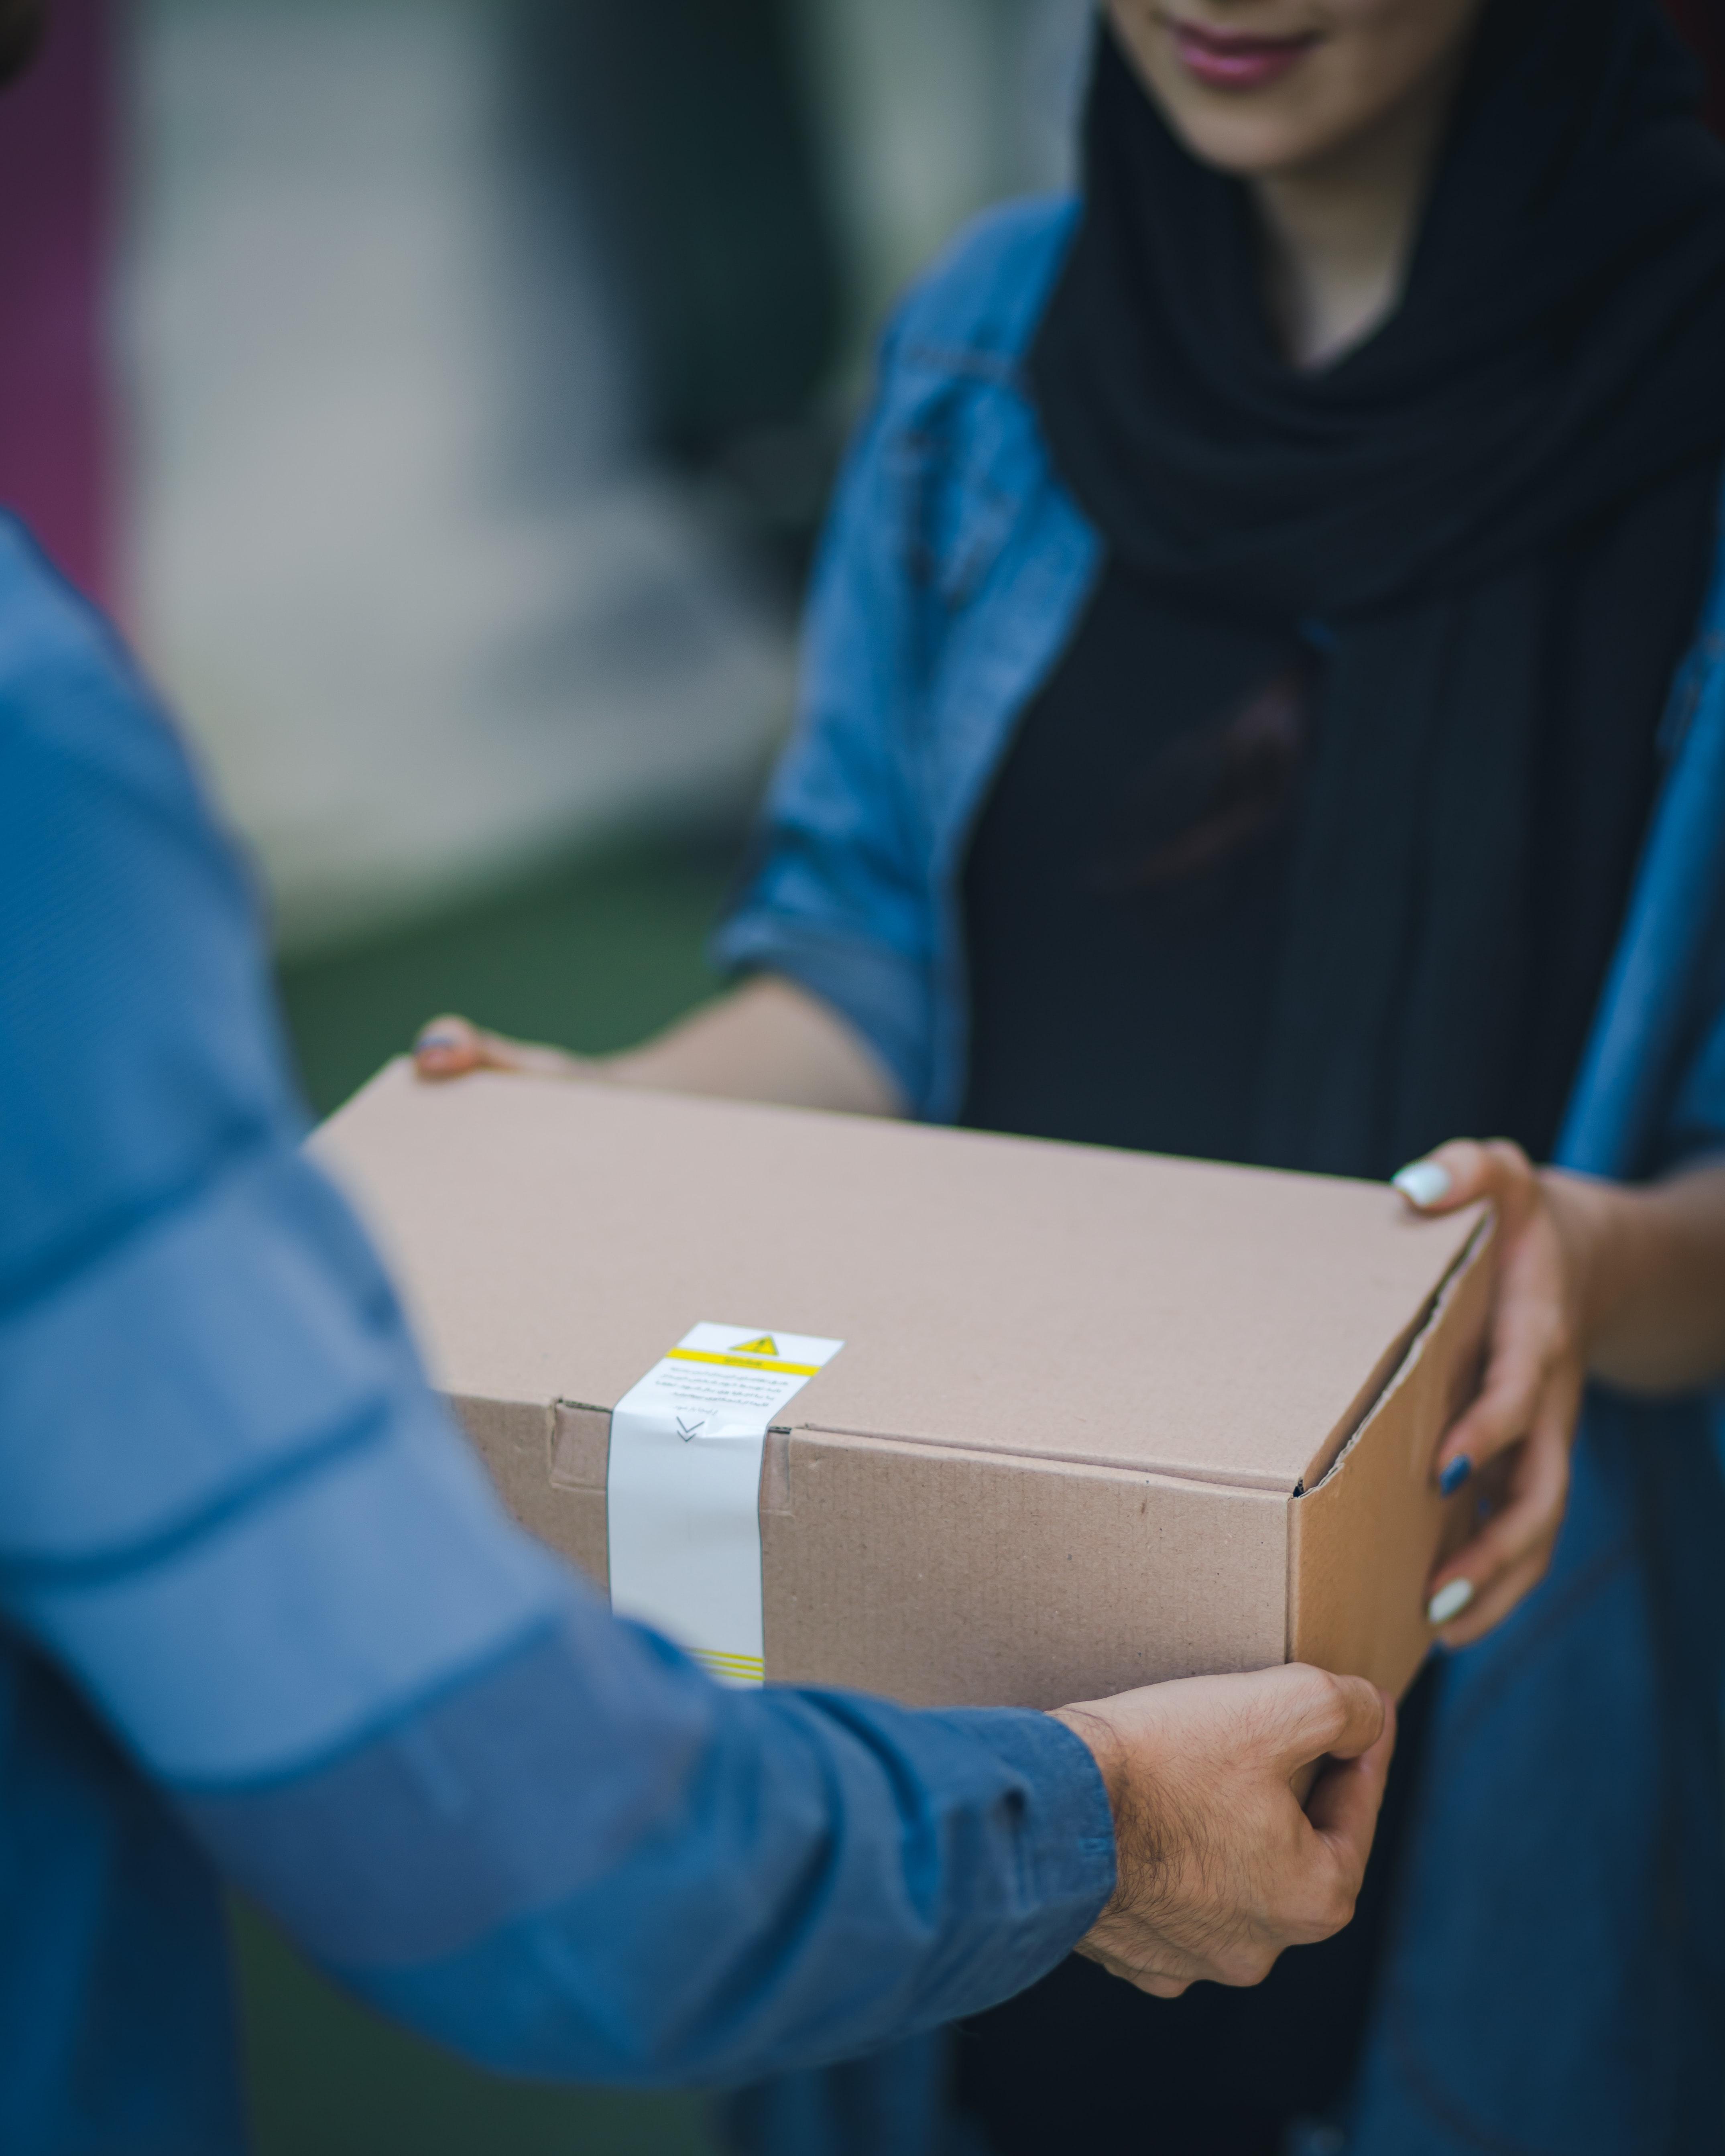 a person delivering bread